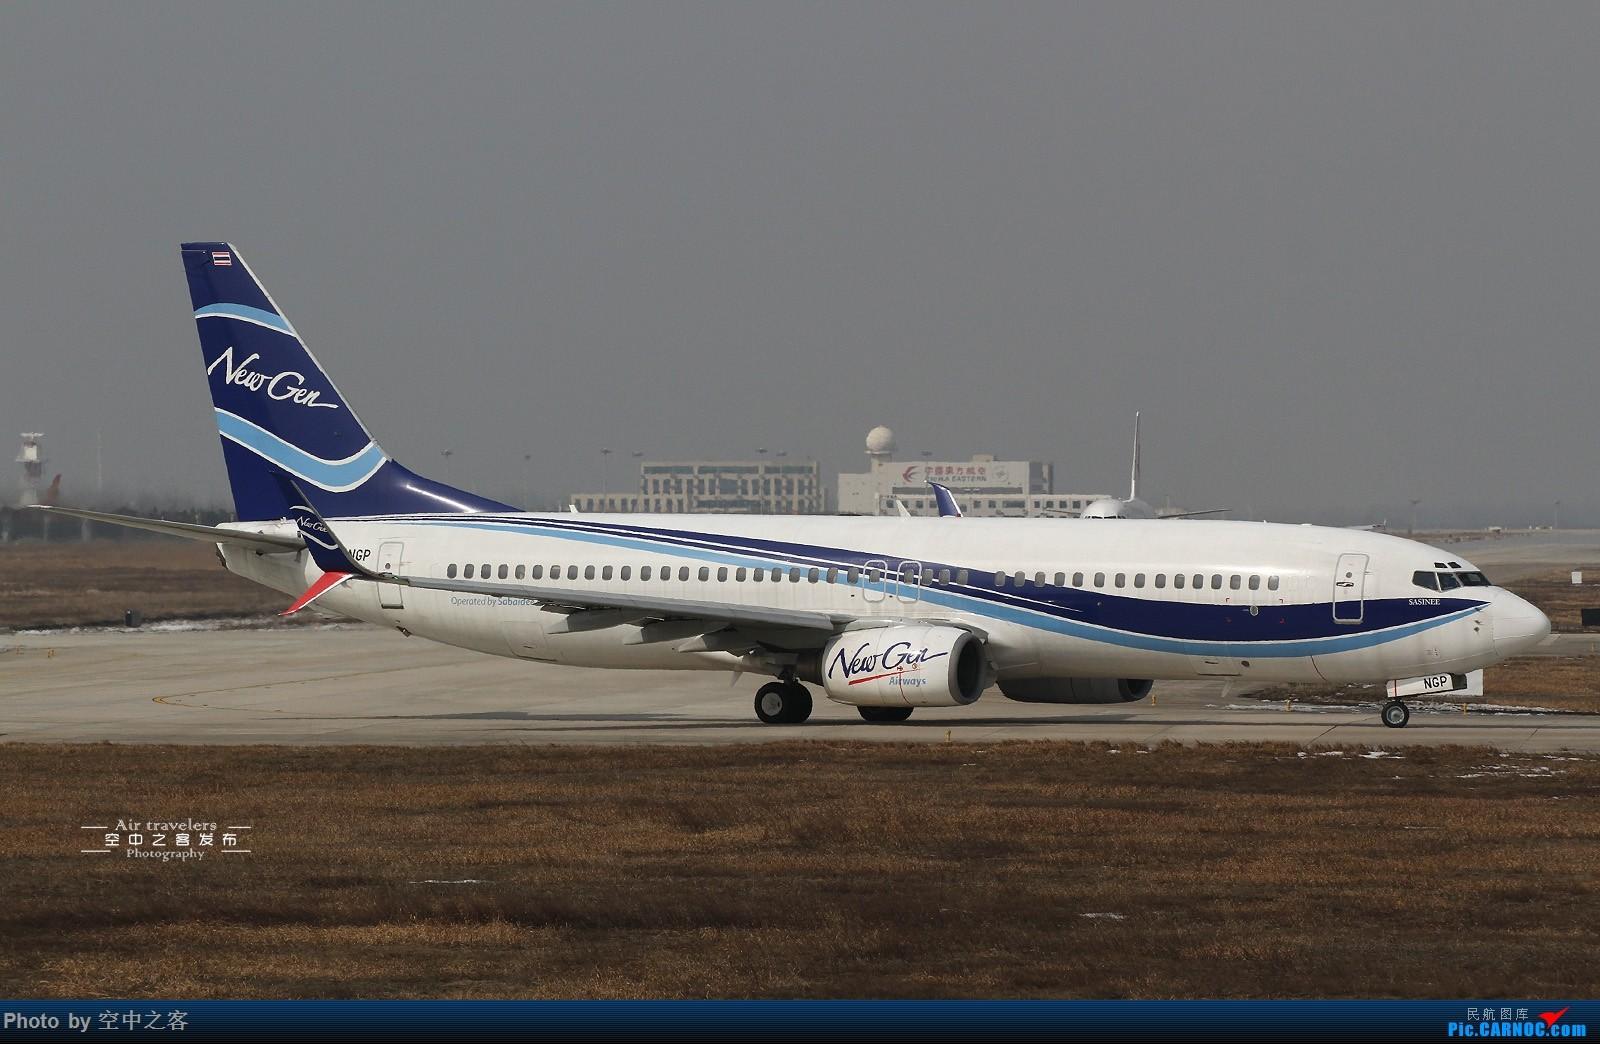 Re:[原创][合肥飞友会-霸都打机队 空中之客发布]2018立春·首次拍机活动 BOEING 737-800 HS-NGP 合肥新桥国际机场